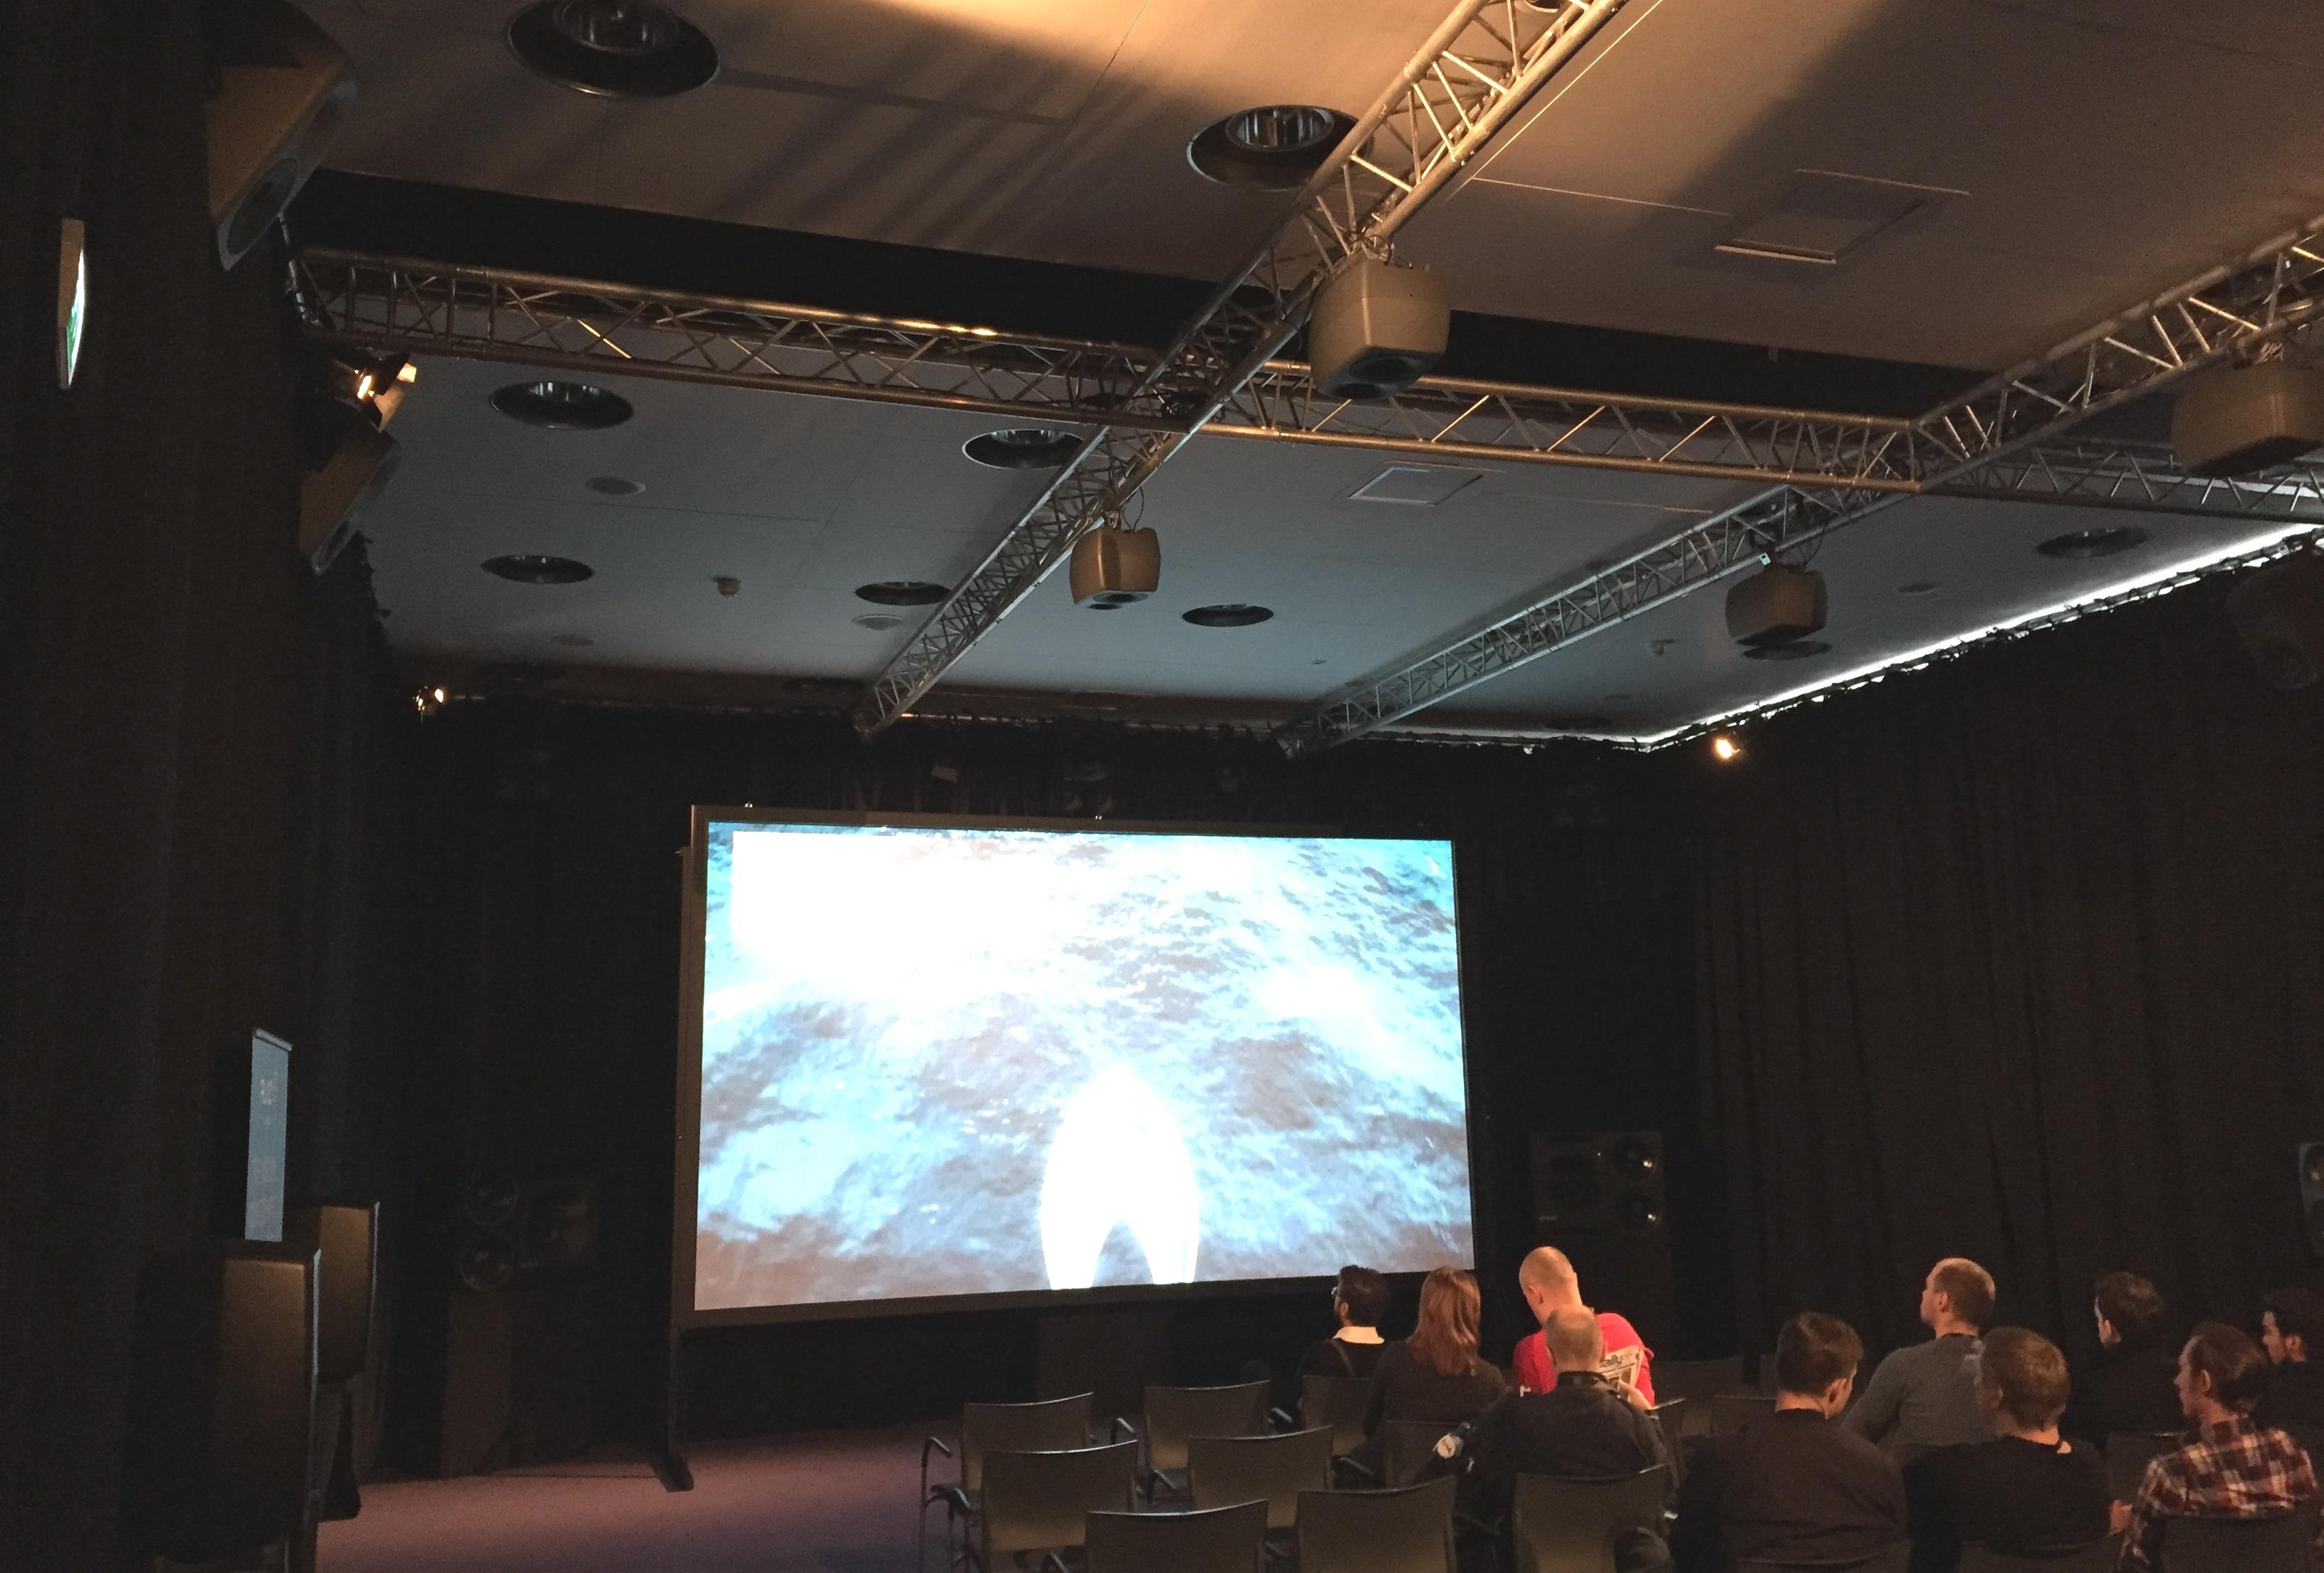 1. Auro Immersive Cinema Experience - DataSat Genelec Barco.jpg